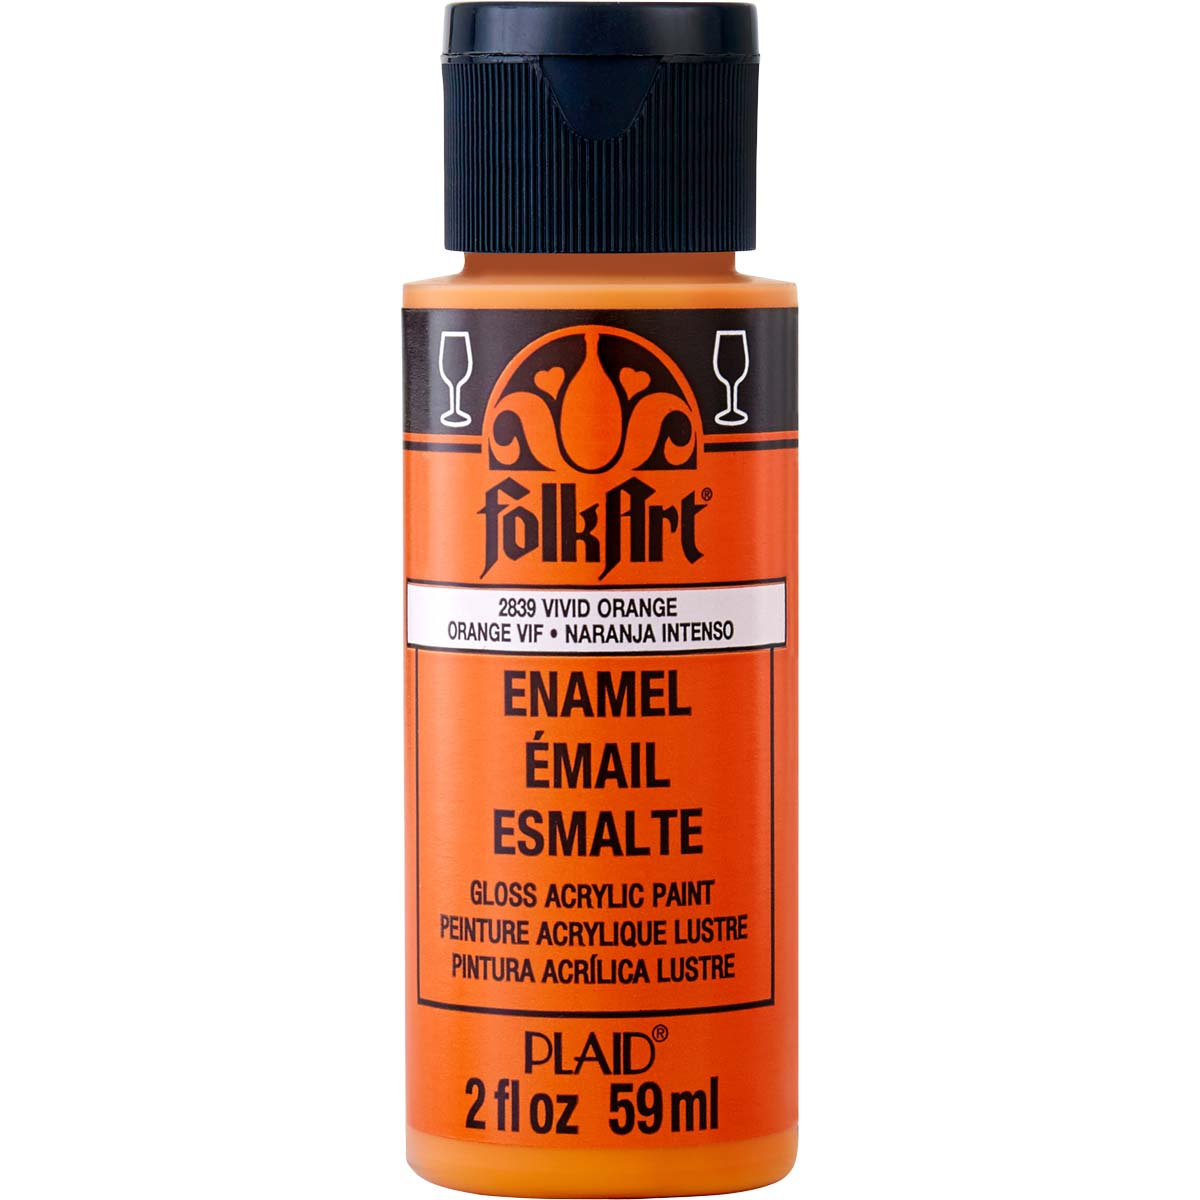 FolkArt ® Enamels™ - Vivid Orange, 2 oz. - 2839